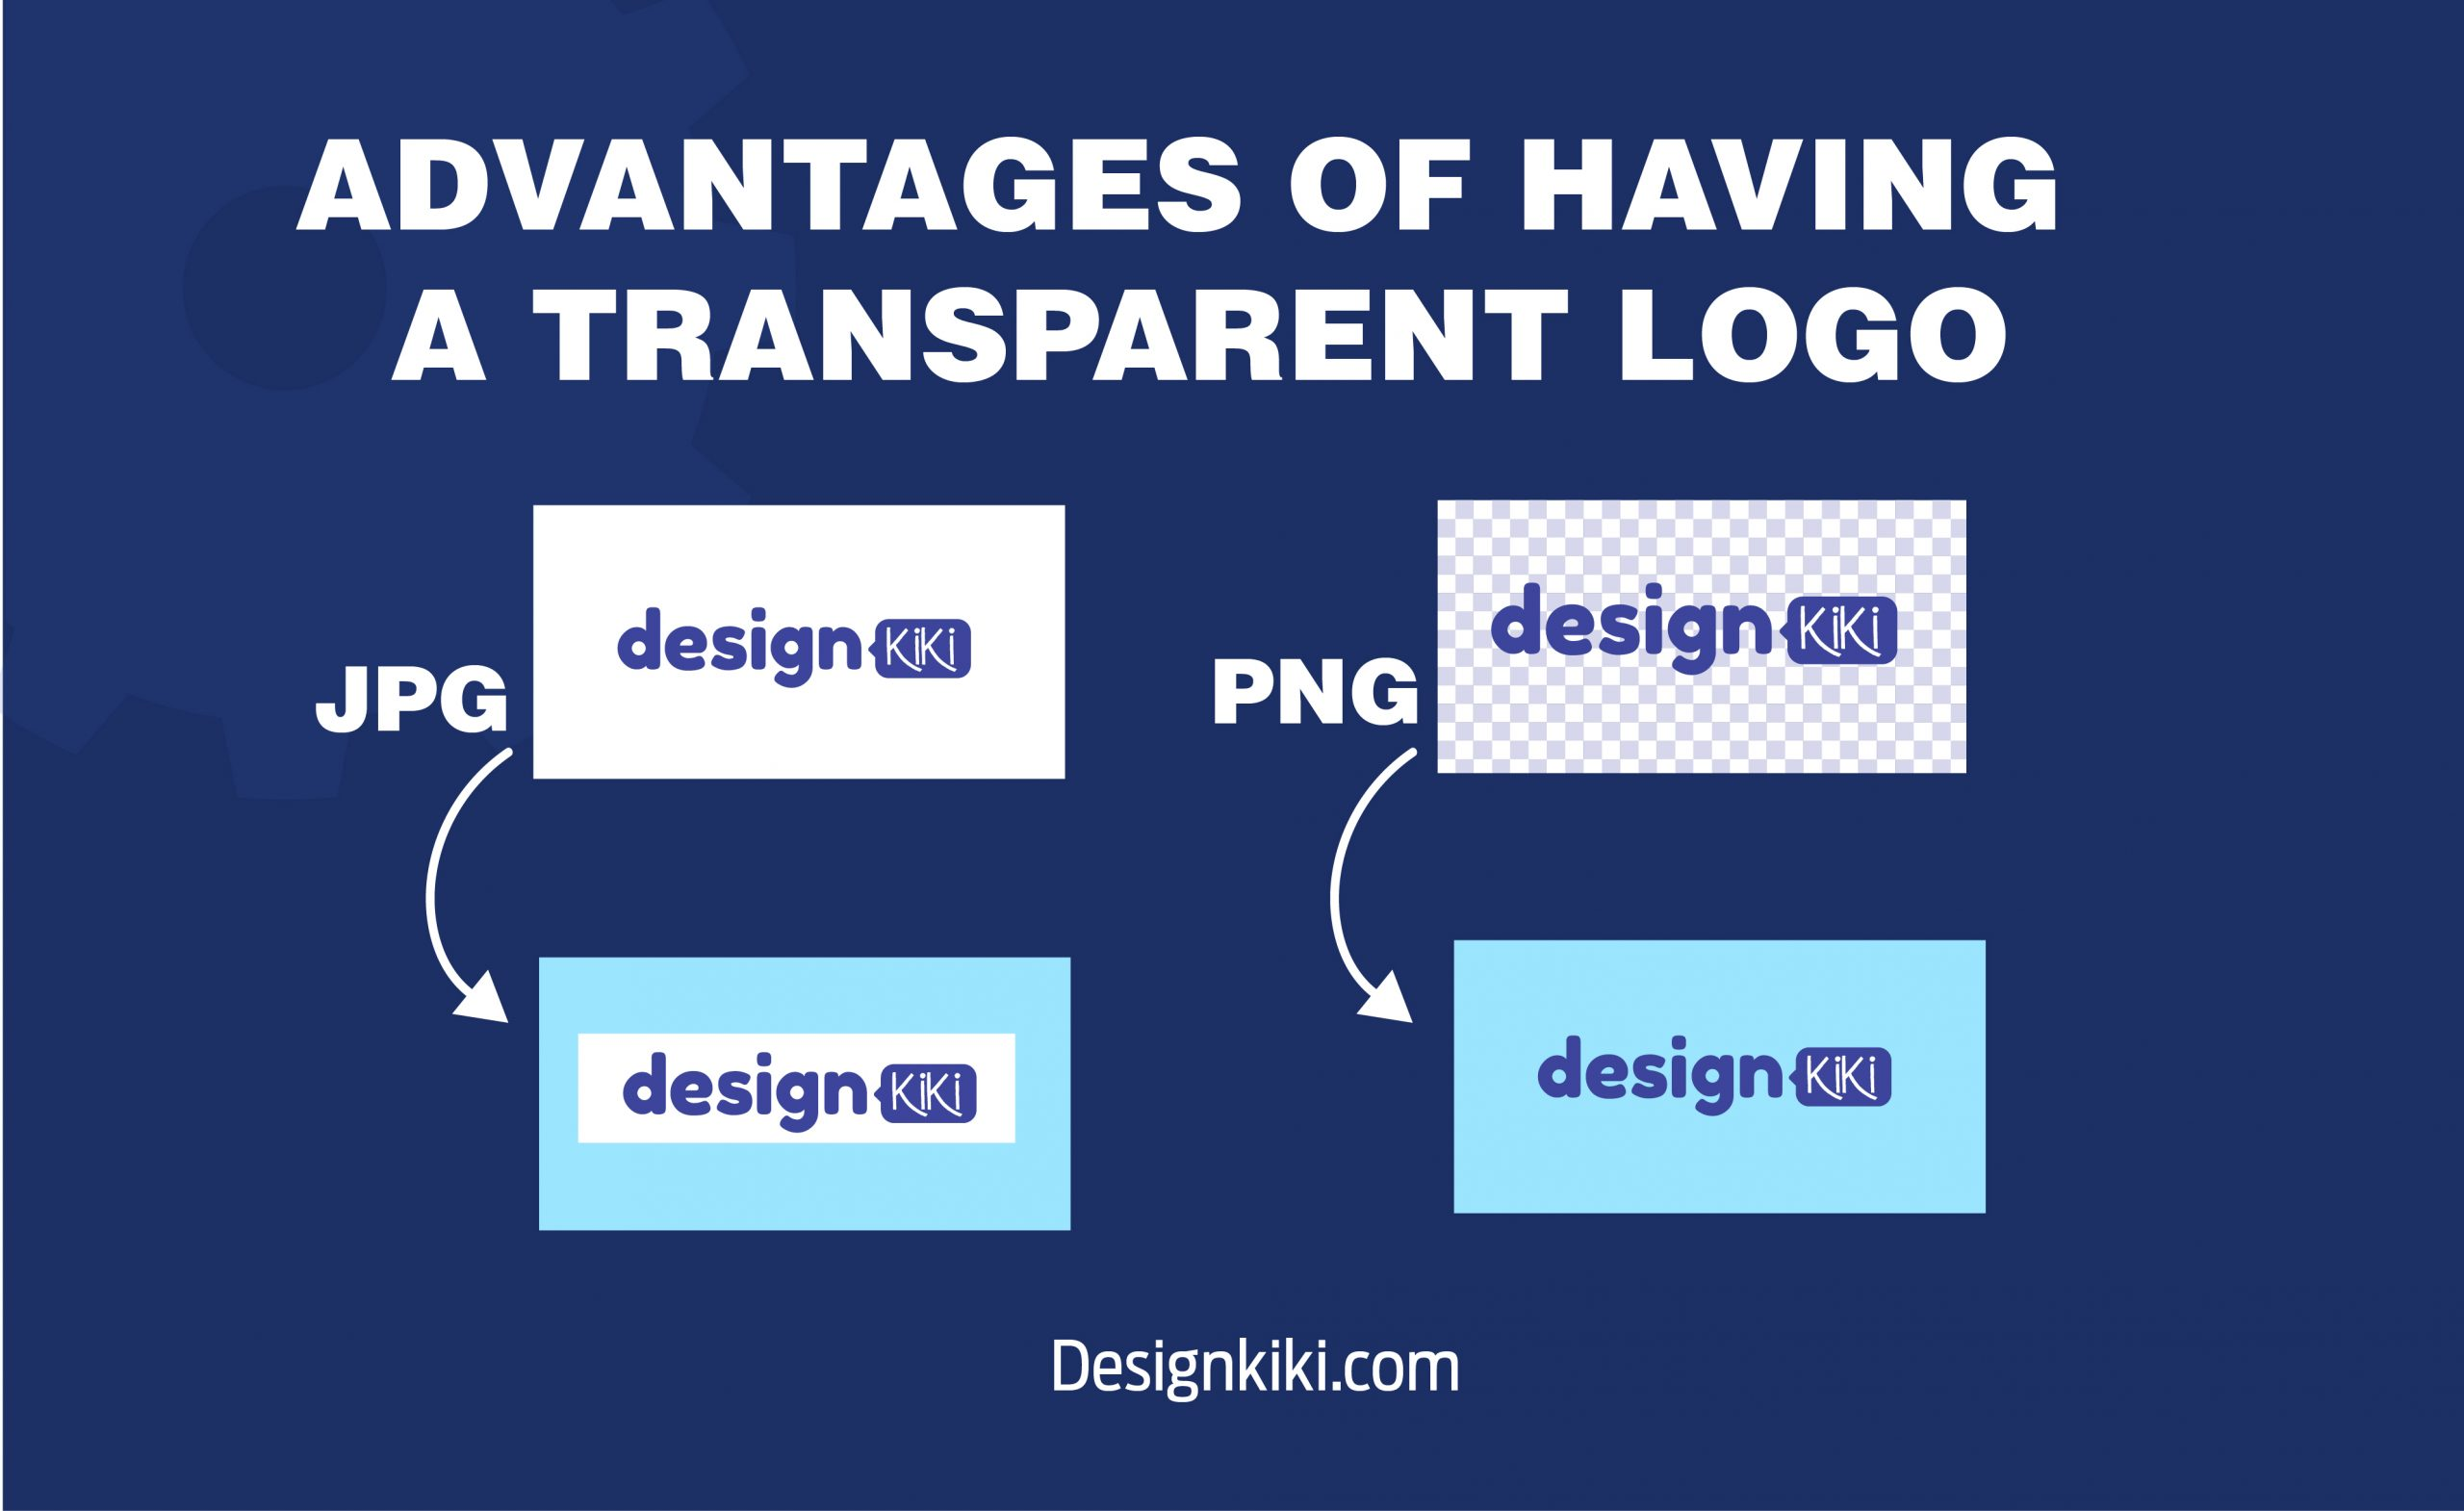 Advantages of having a transparent logo